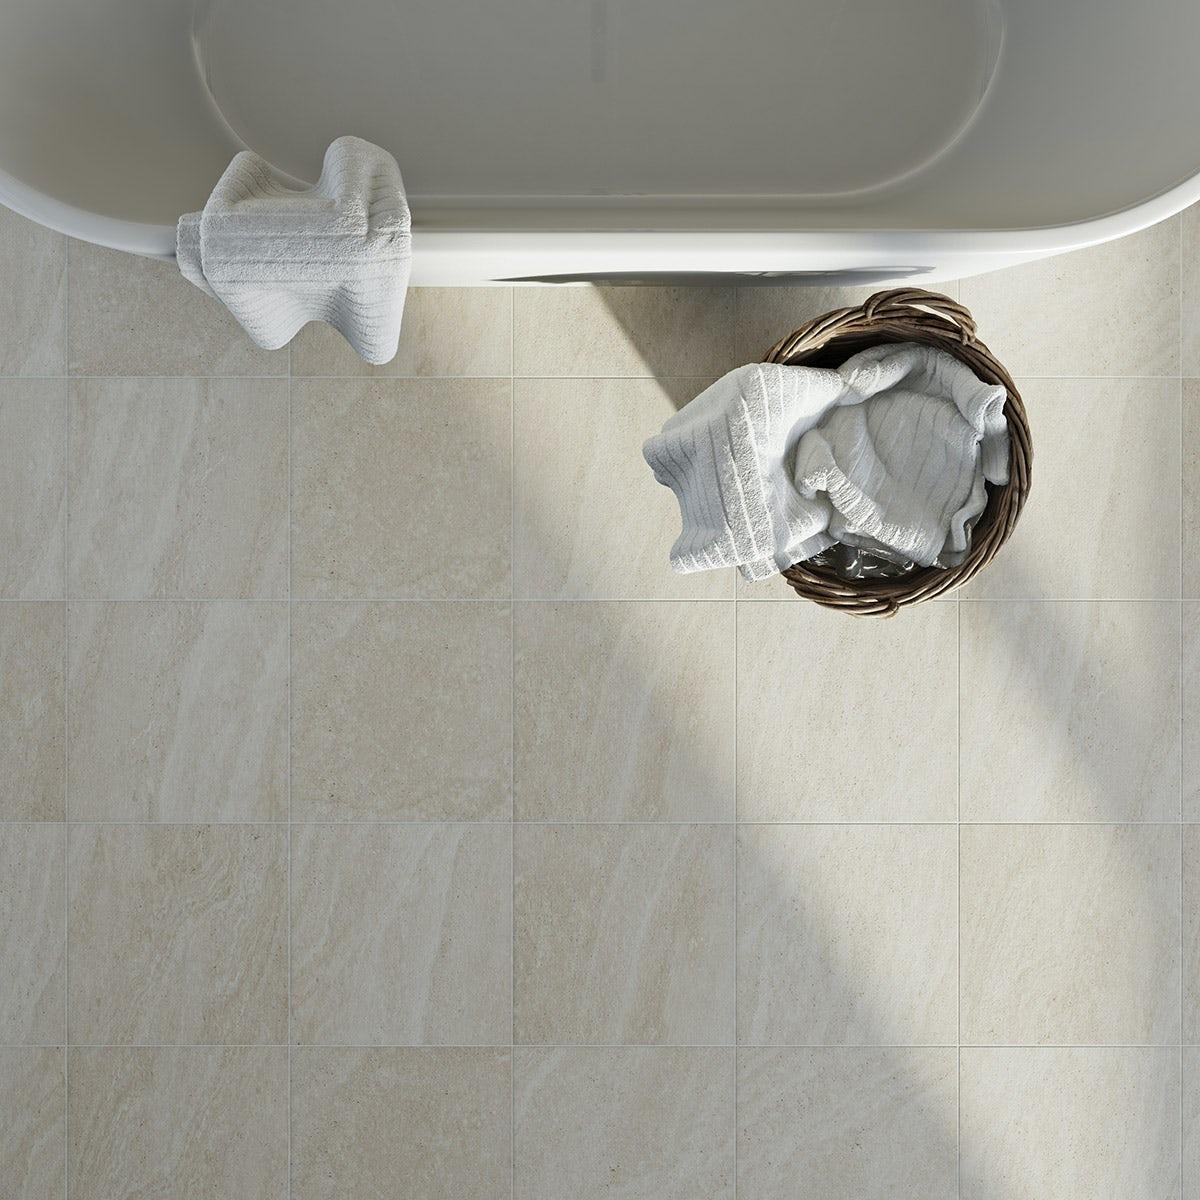 British Ceramic Tile Pumice beige light matt tile 331mm x 331mm